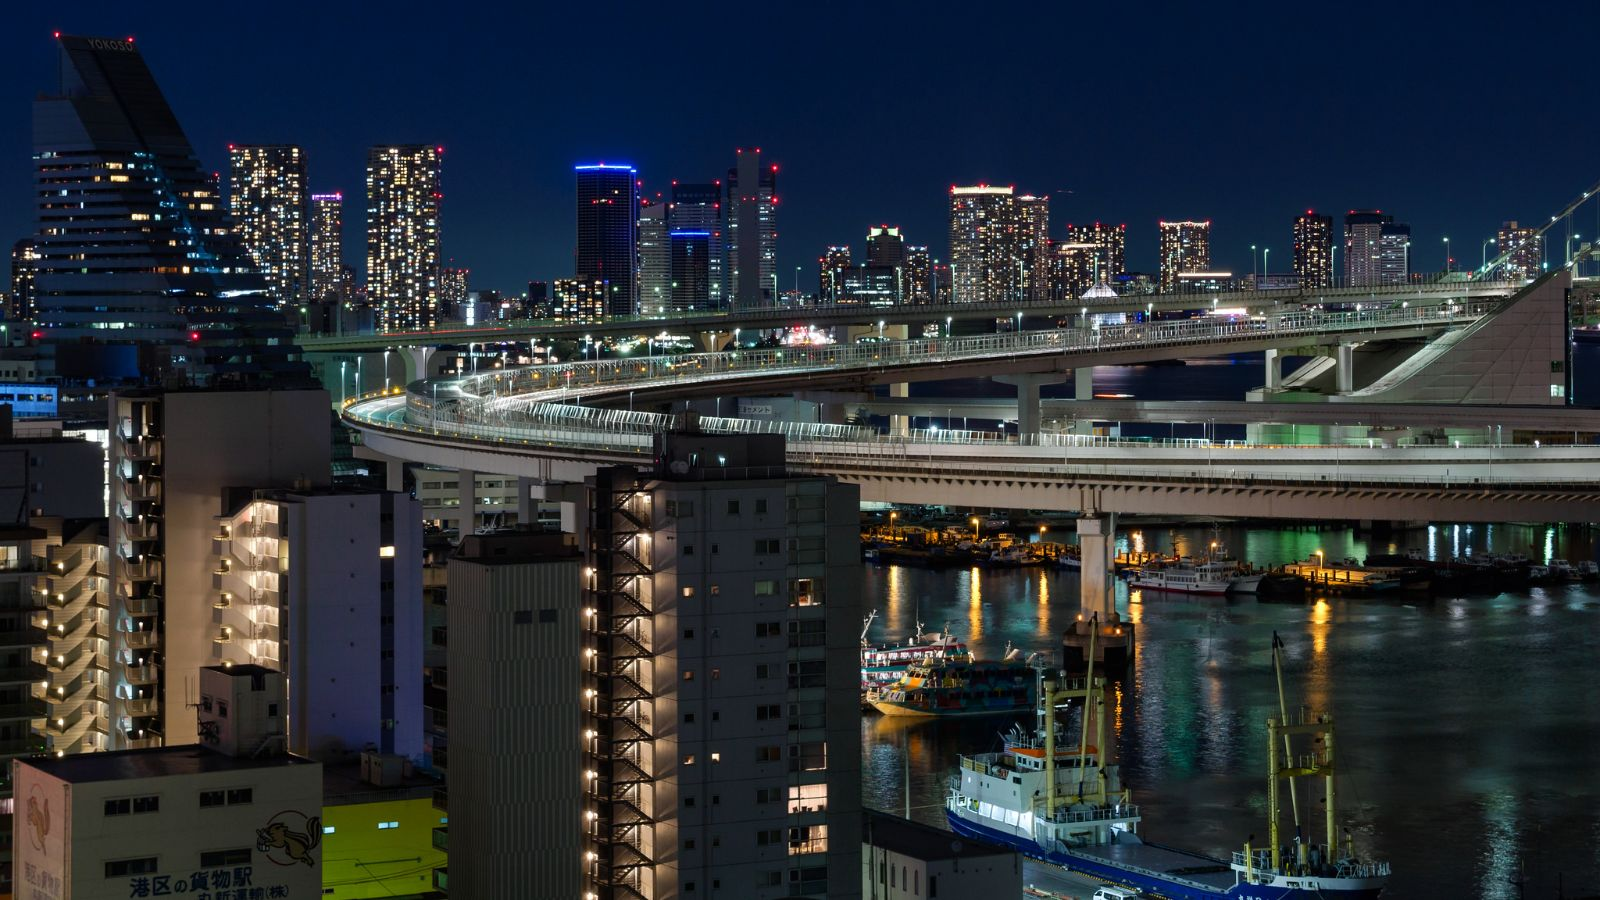 Tokio deslumbra e intimida